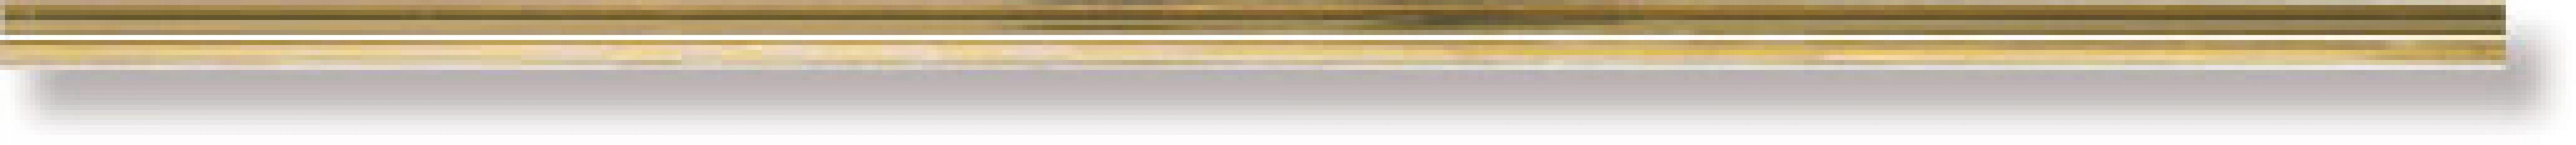 Бордюр Moldura Romanza Oro 1x50